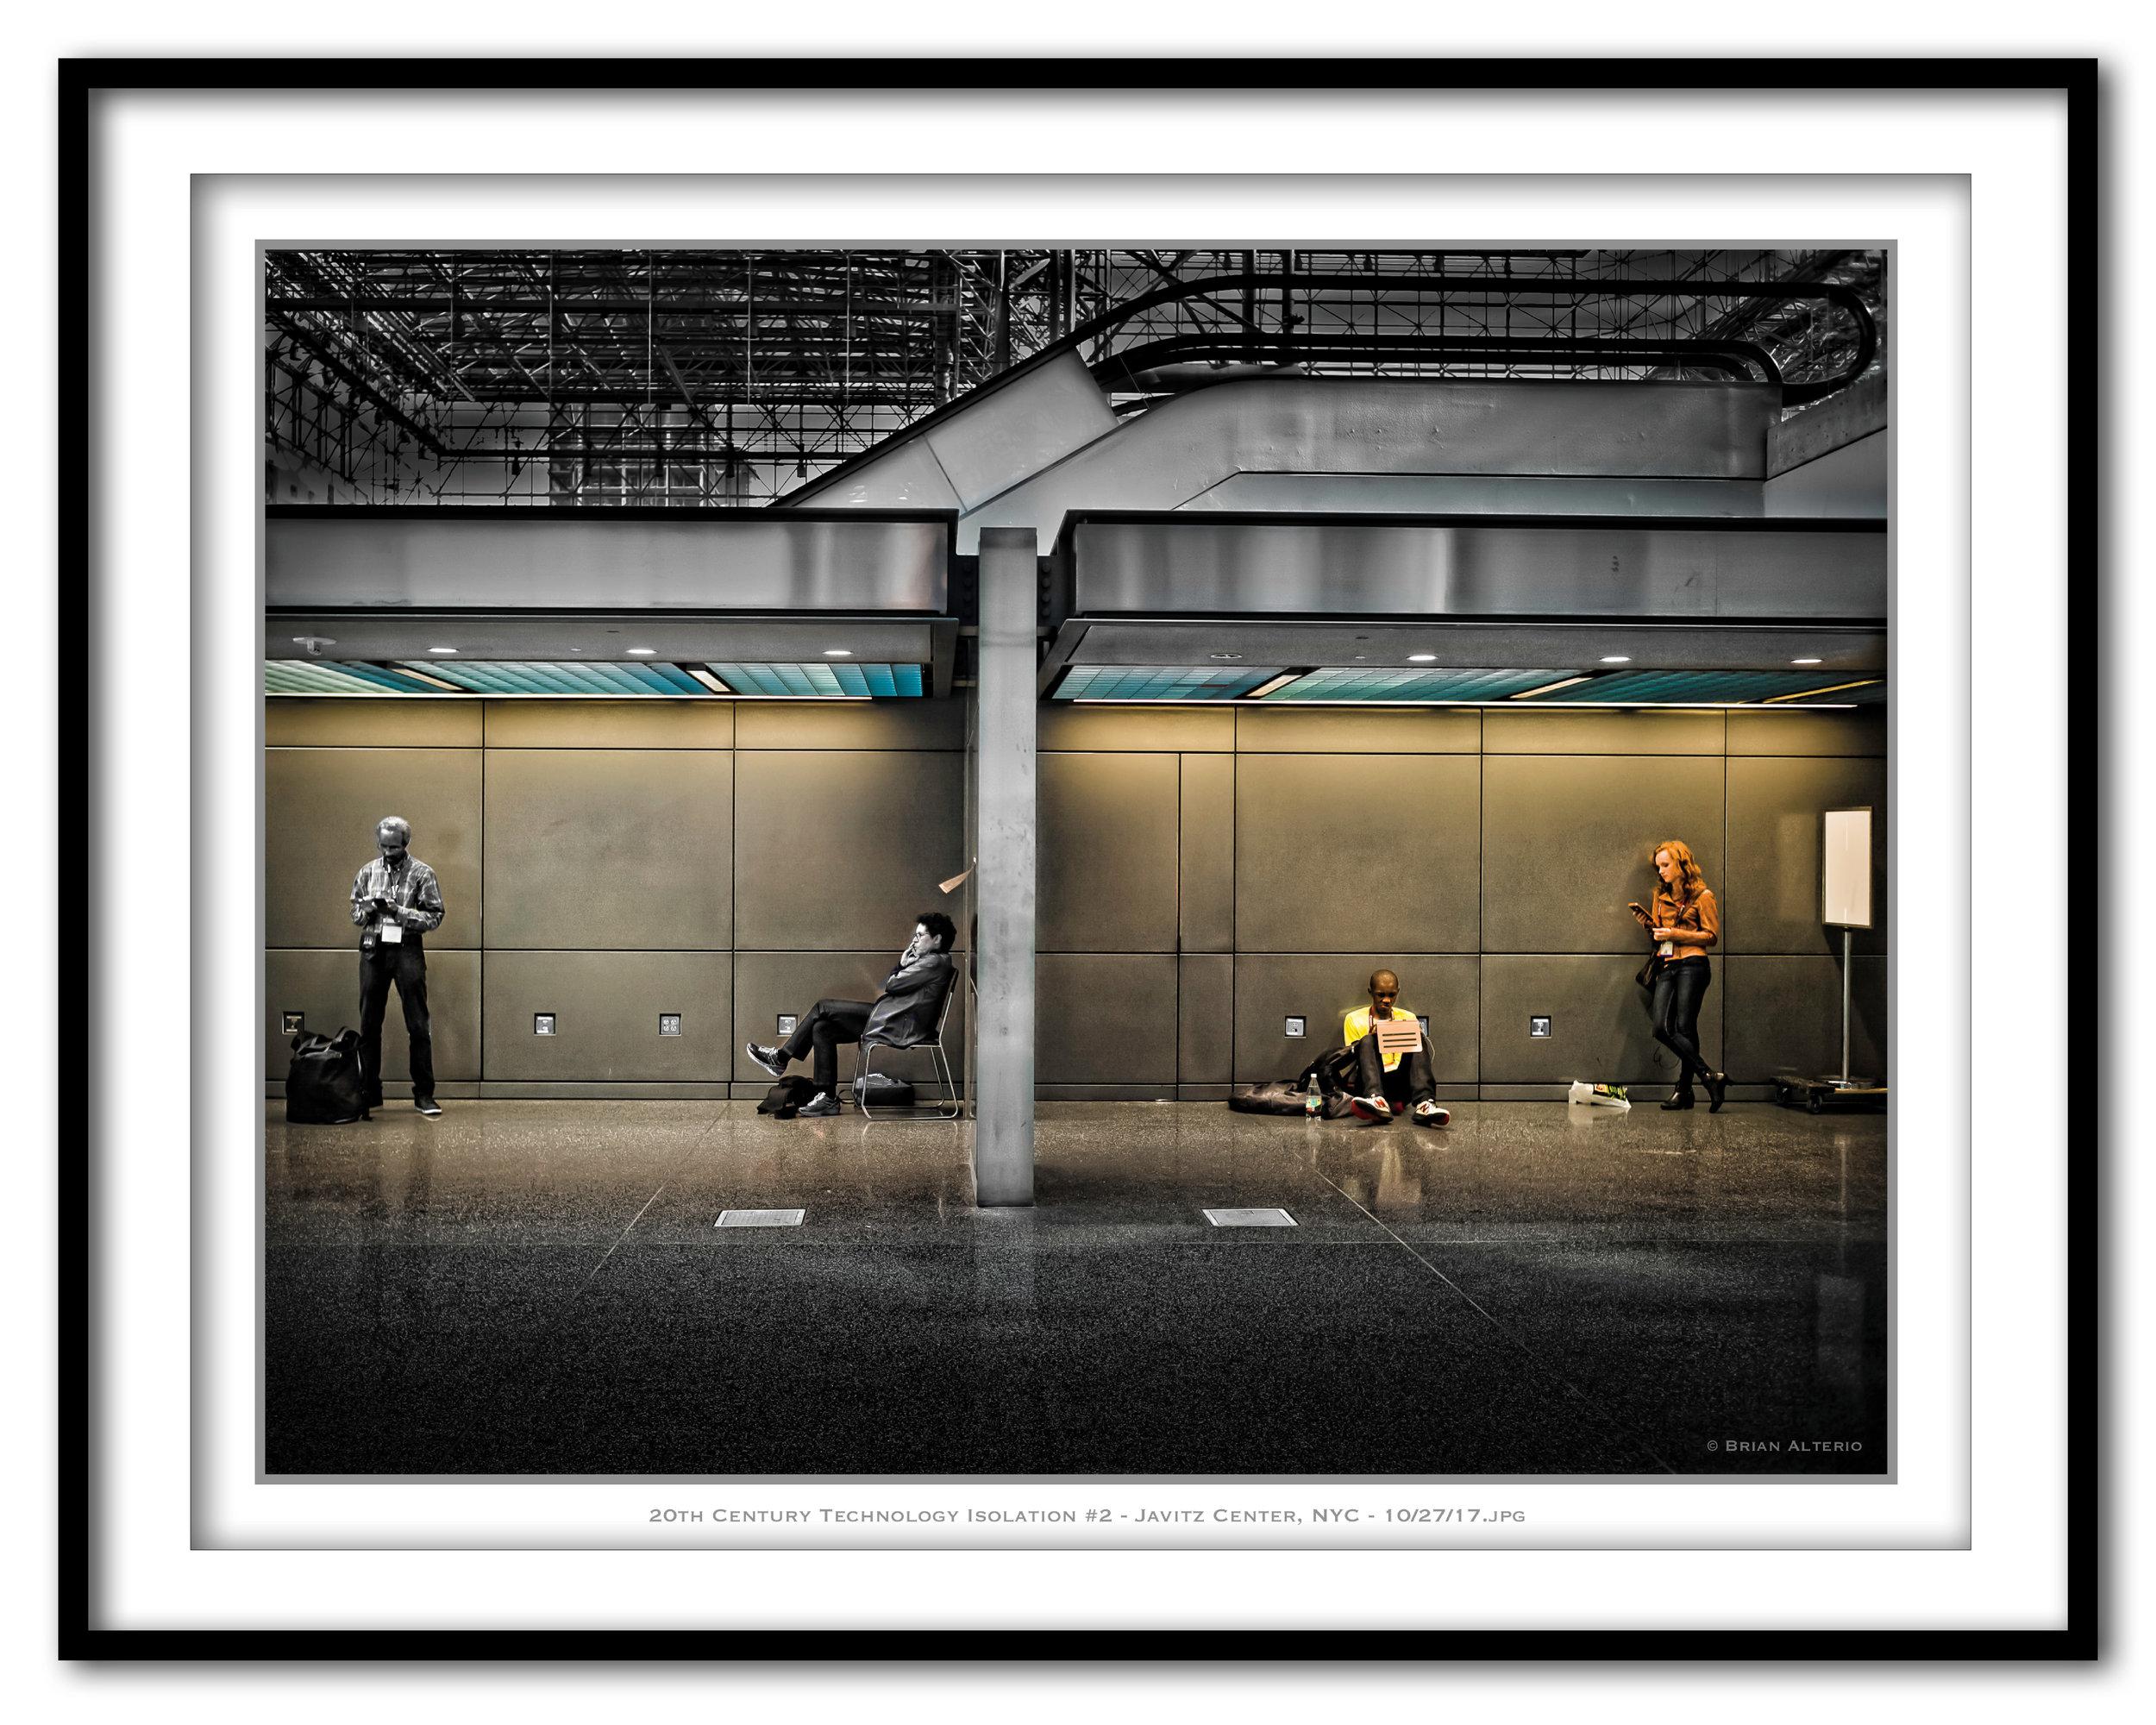 20th Century Technology Isolation #2 - Javitz Center, NYC - 10-27-17 -Framed.jpg